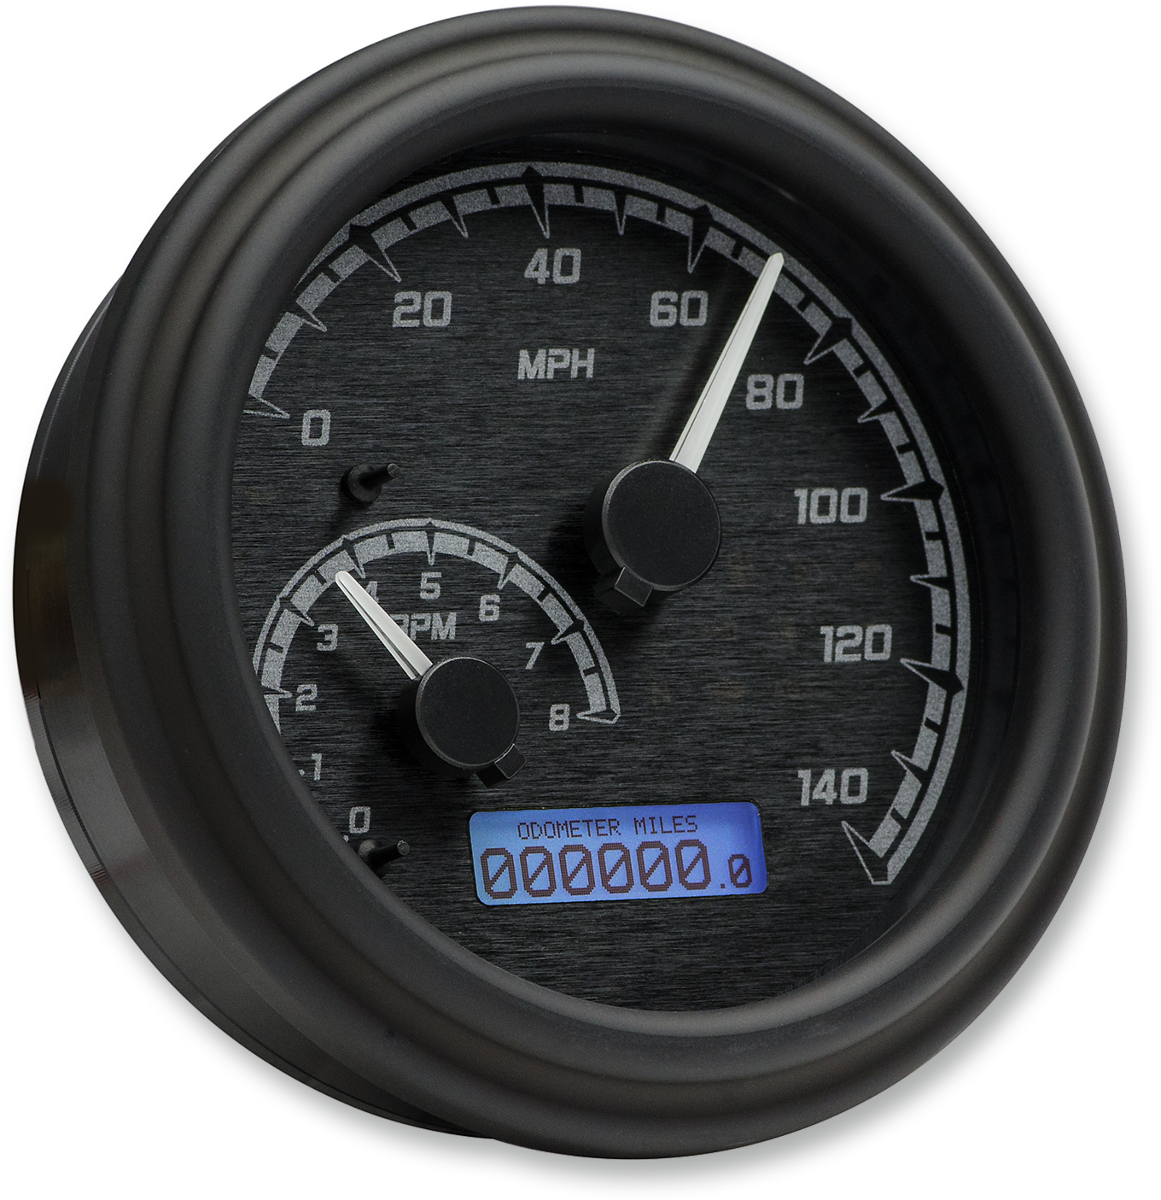 Dakota Digital Black Fatbob Tank Mounted Speedometer 96-03 Harley Softail FLHT